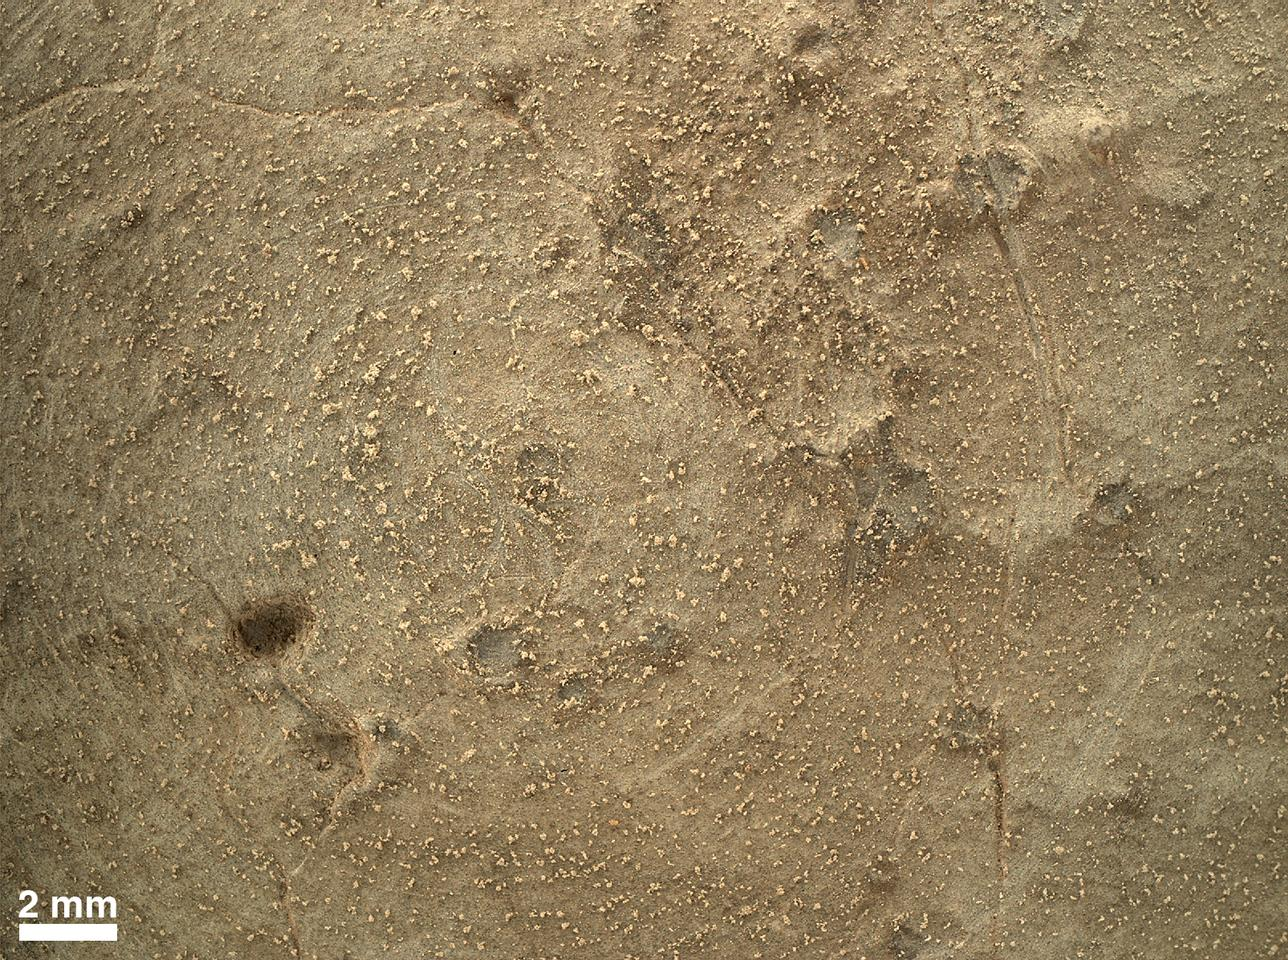 "Close-up of brushed area on rock ""Ekwir_1"" at highest resolution of the Mars Hand Lens Imager (MAHLI) (Imaget: NASA/JPL-Caltech/MSSS)"